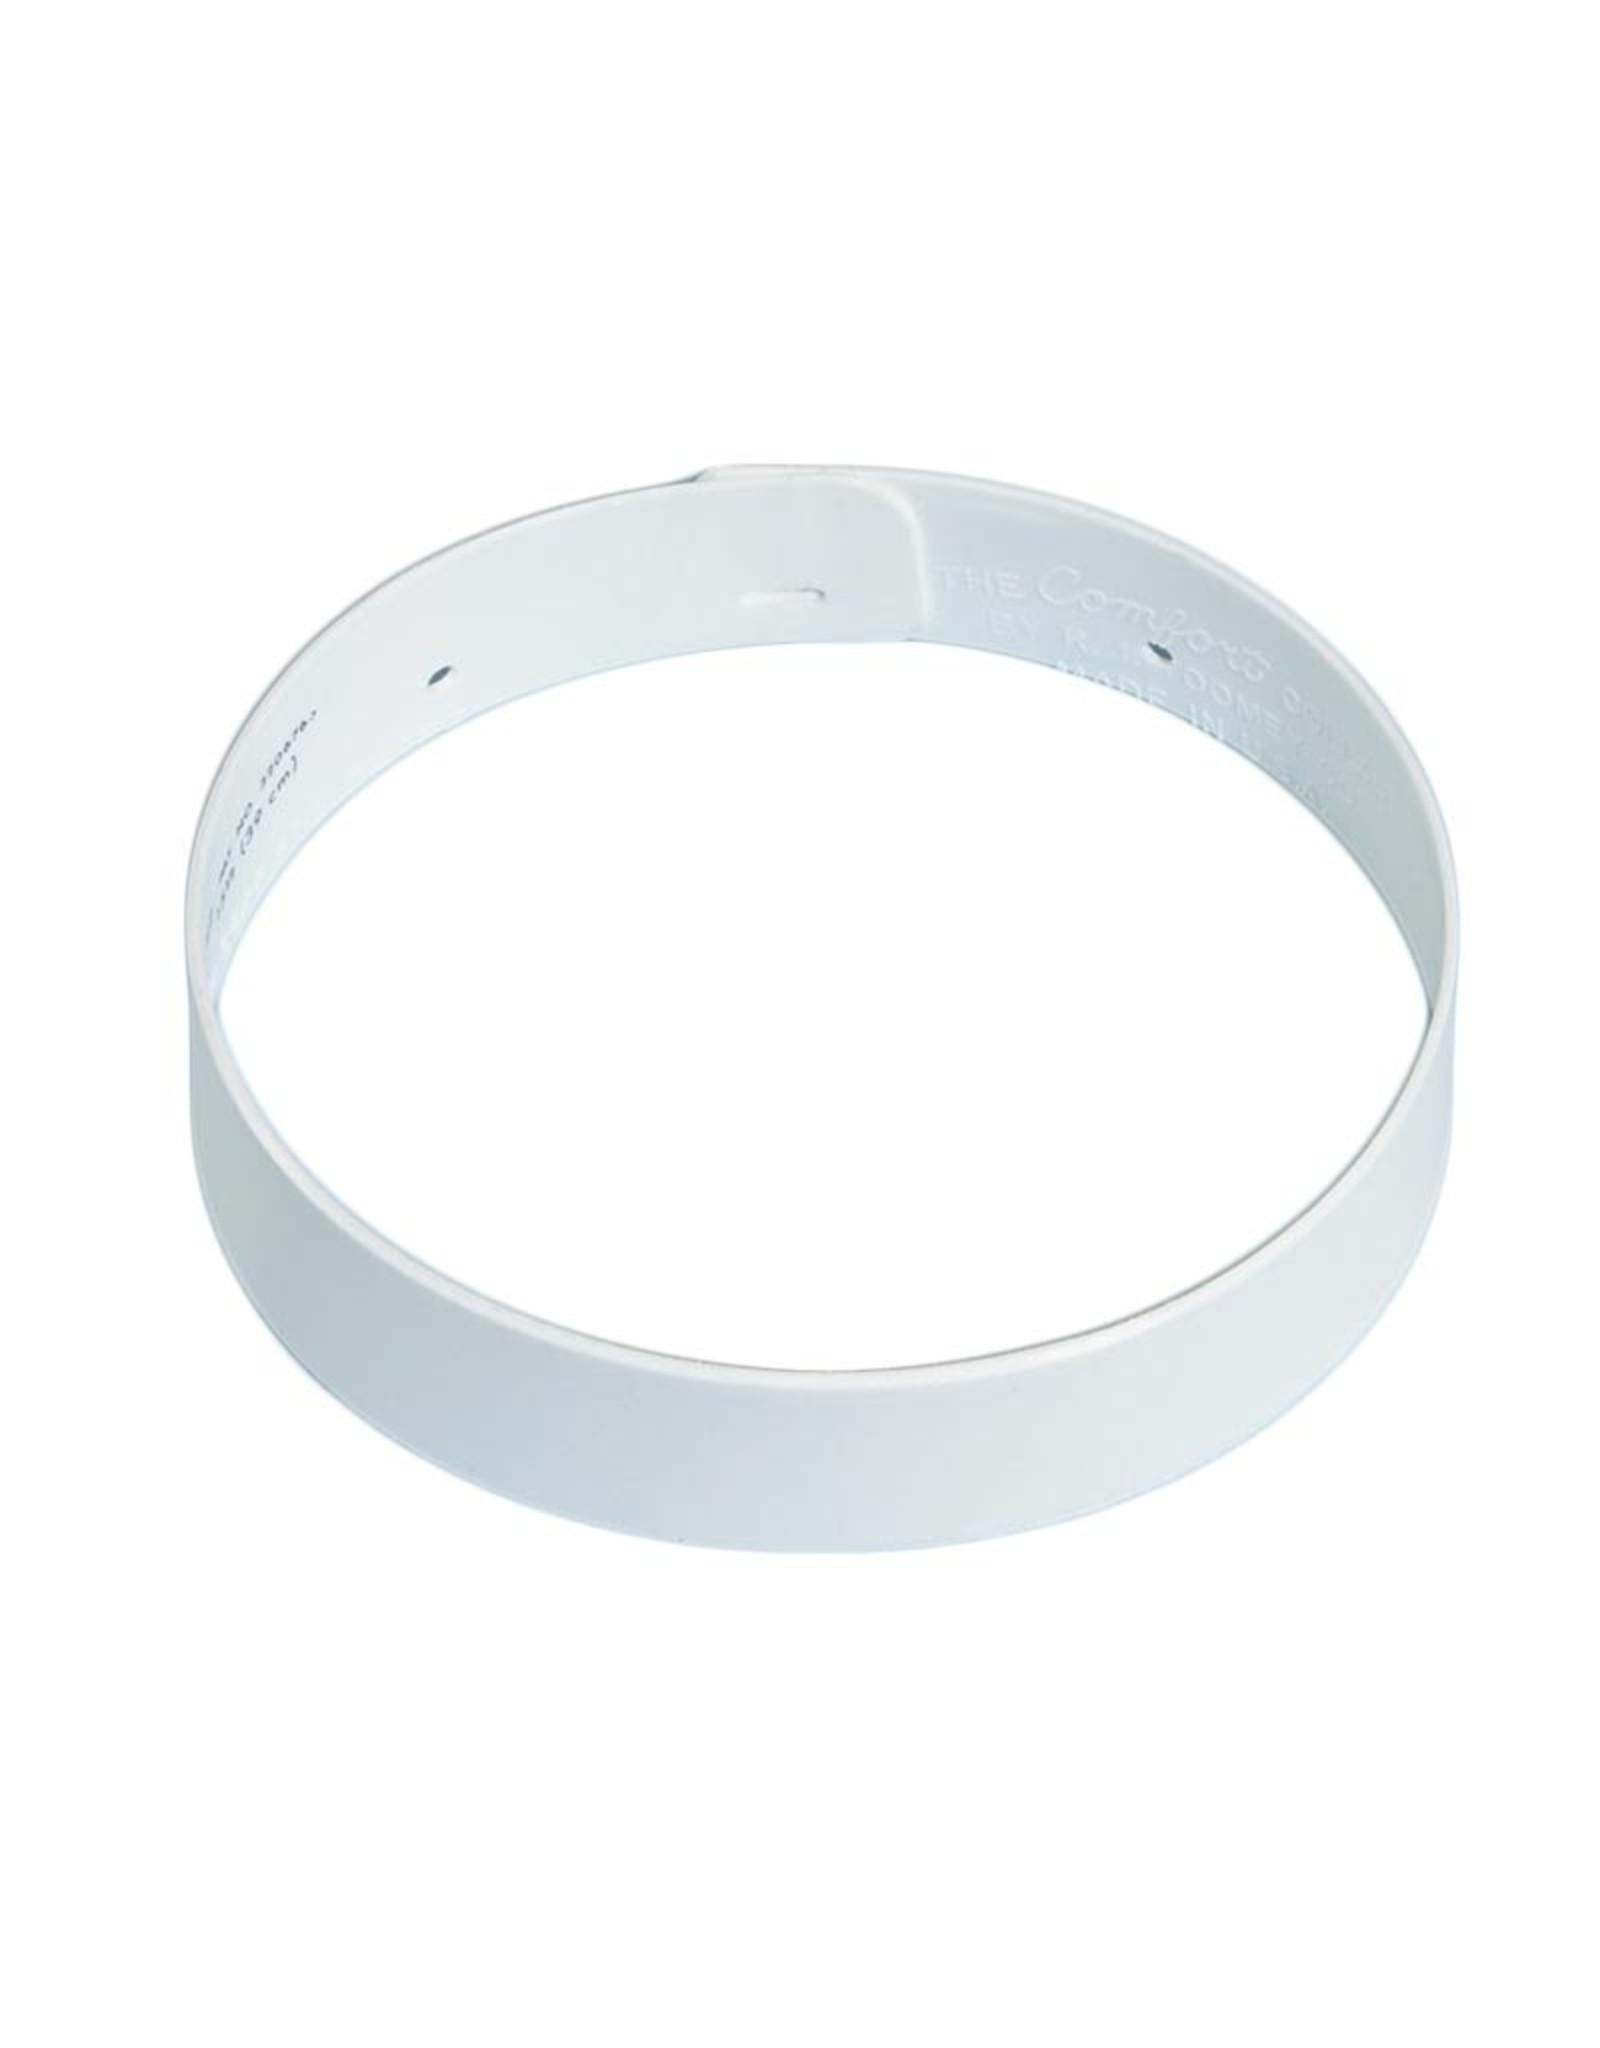 Single-Ply Comfort Collar 16.5 #2 Collar Height